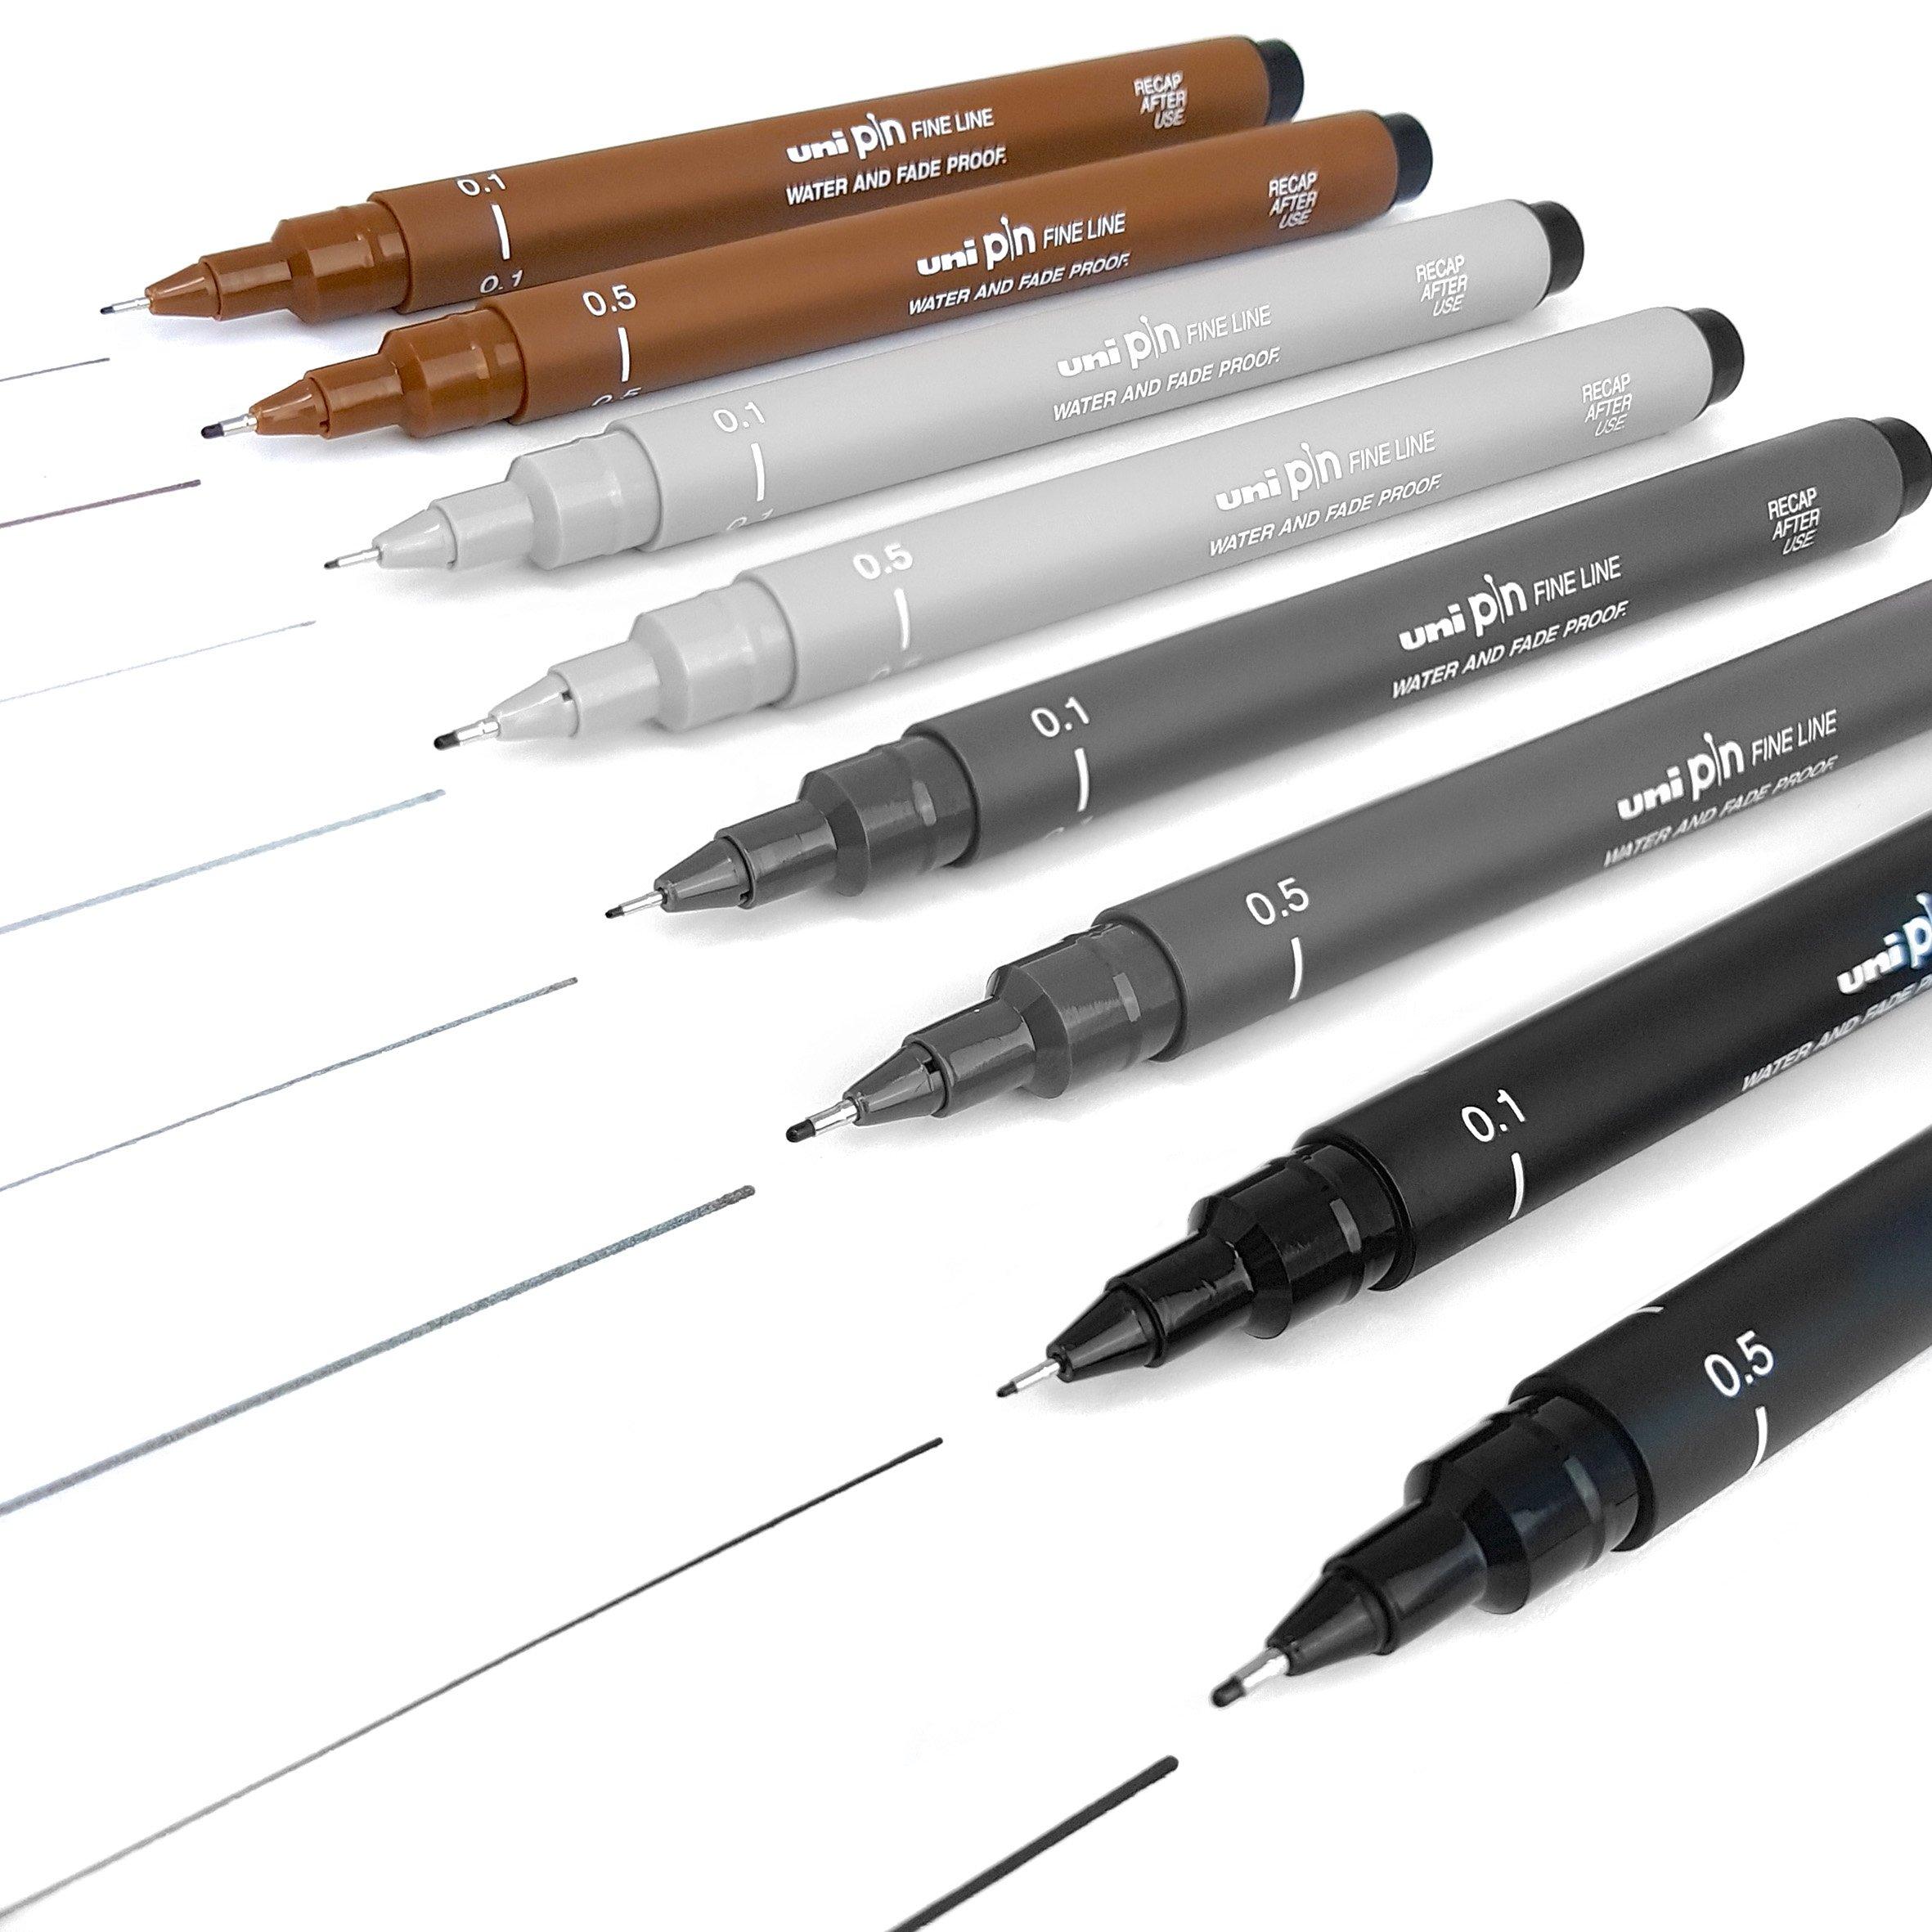 Uni Pin Fineliner Drawing Pen - Sketching Set of 8-0.1mm/0.5mm - Black, Dark Grey, Light Grey, and Sepia by Uni Pin (Image #2)